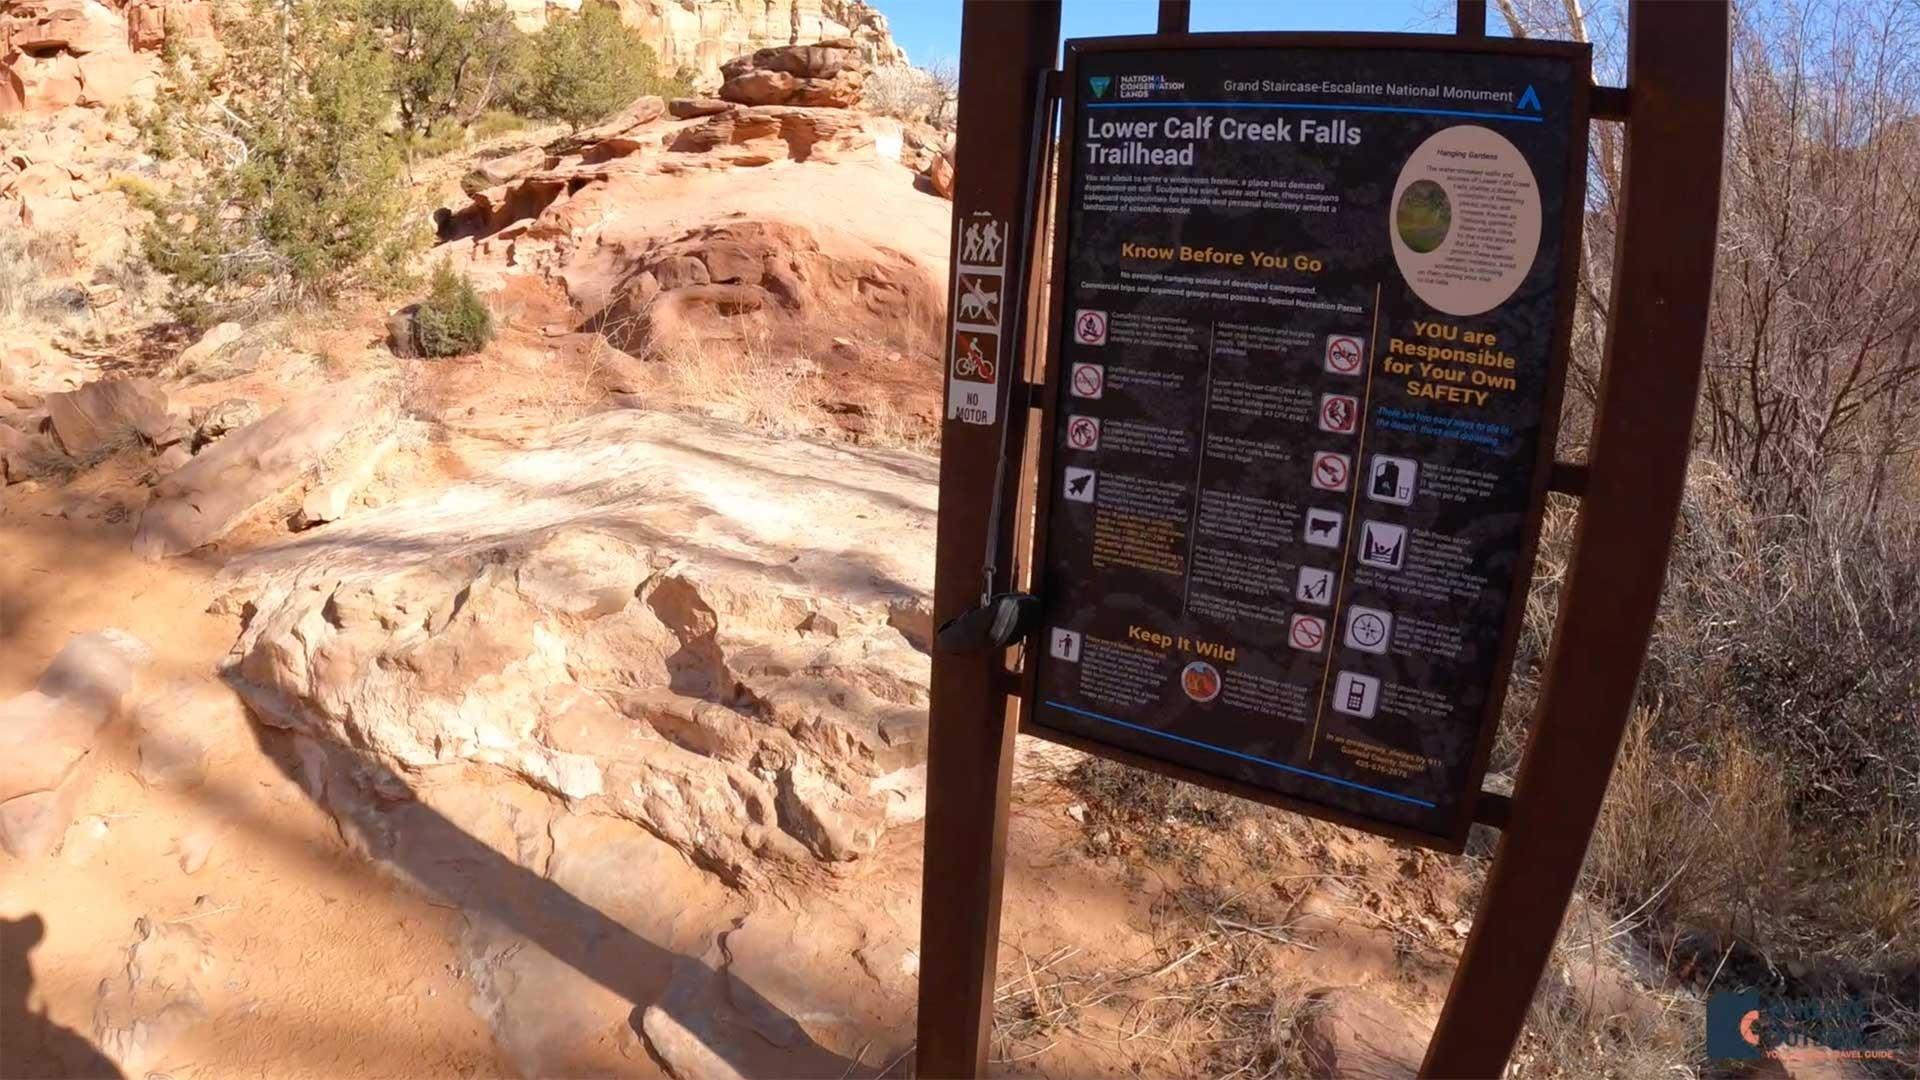 The Lower Calf Creek Falls Trailhead Sign